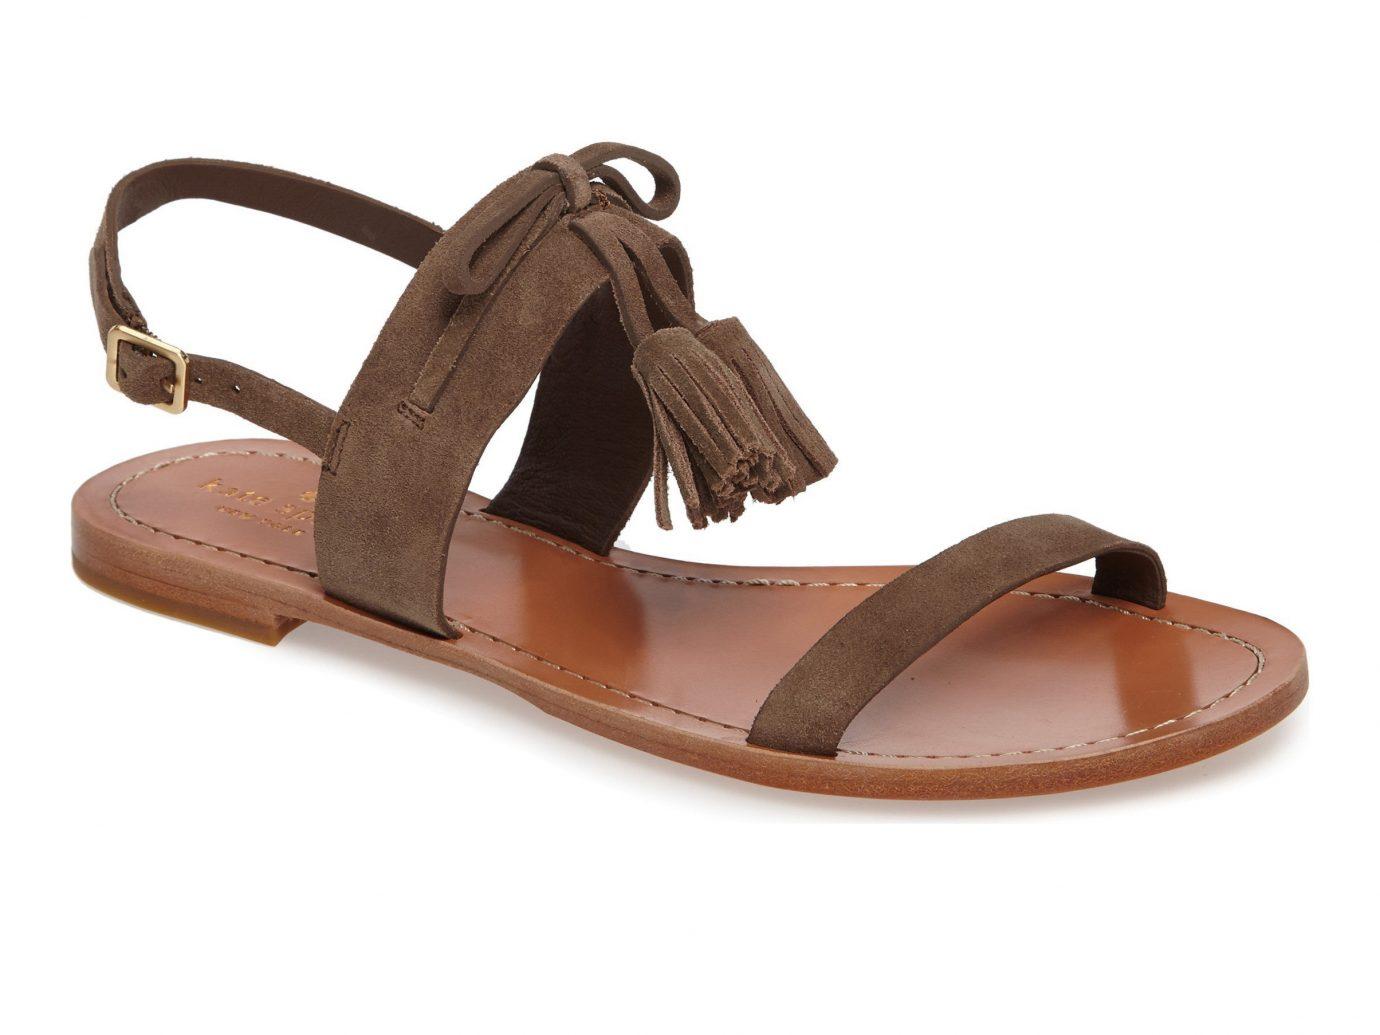 Style + Design footwear brown product chocolate sandal shoe belt piece strap slide sandal beige walking shoe product design outdoor shoe